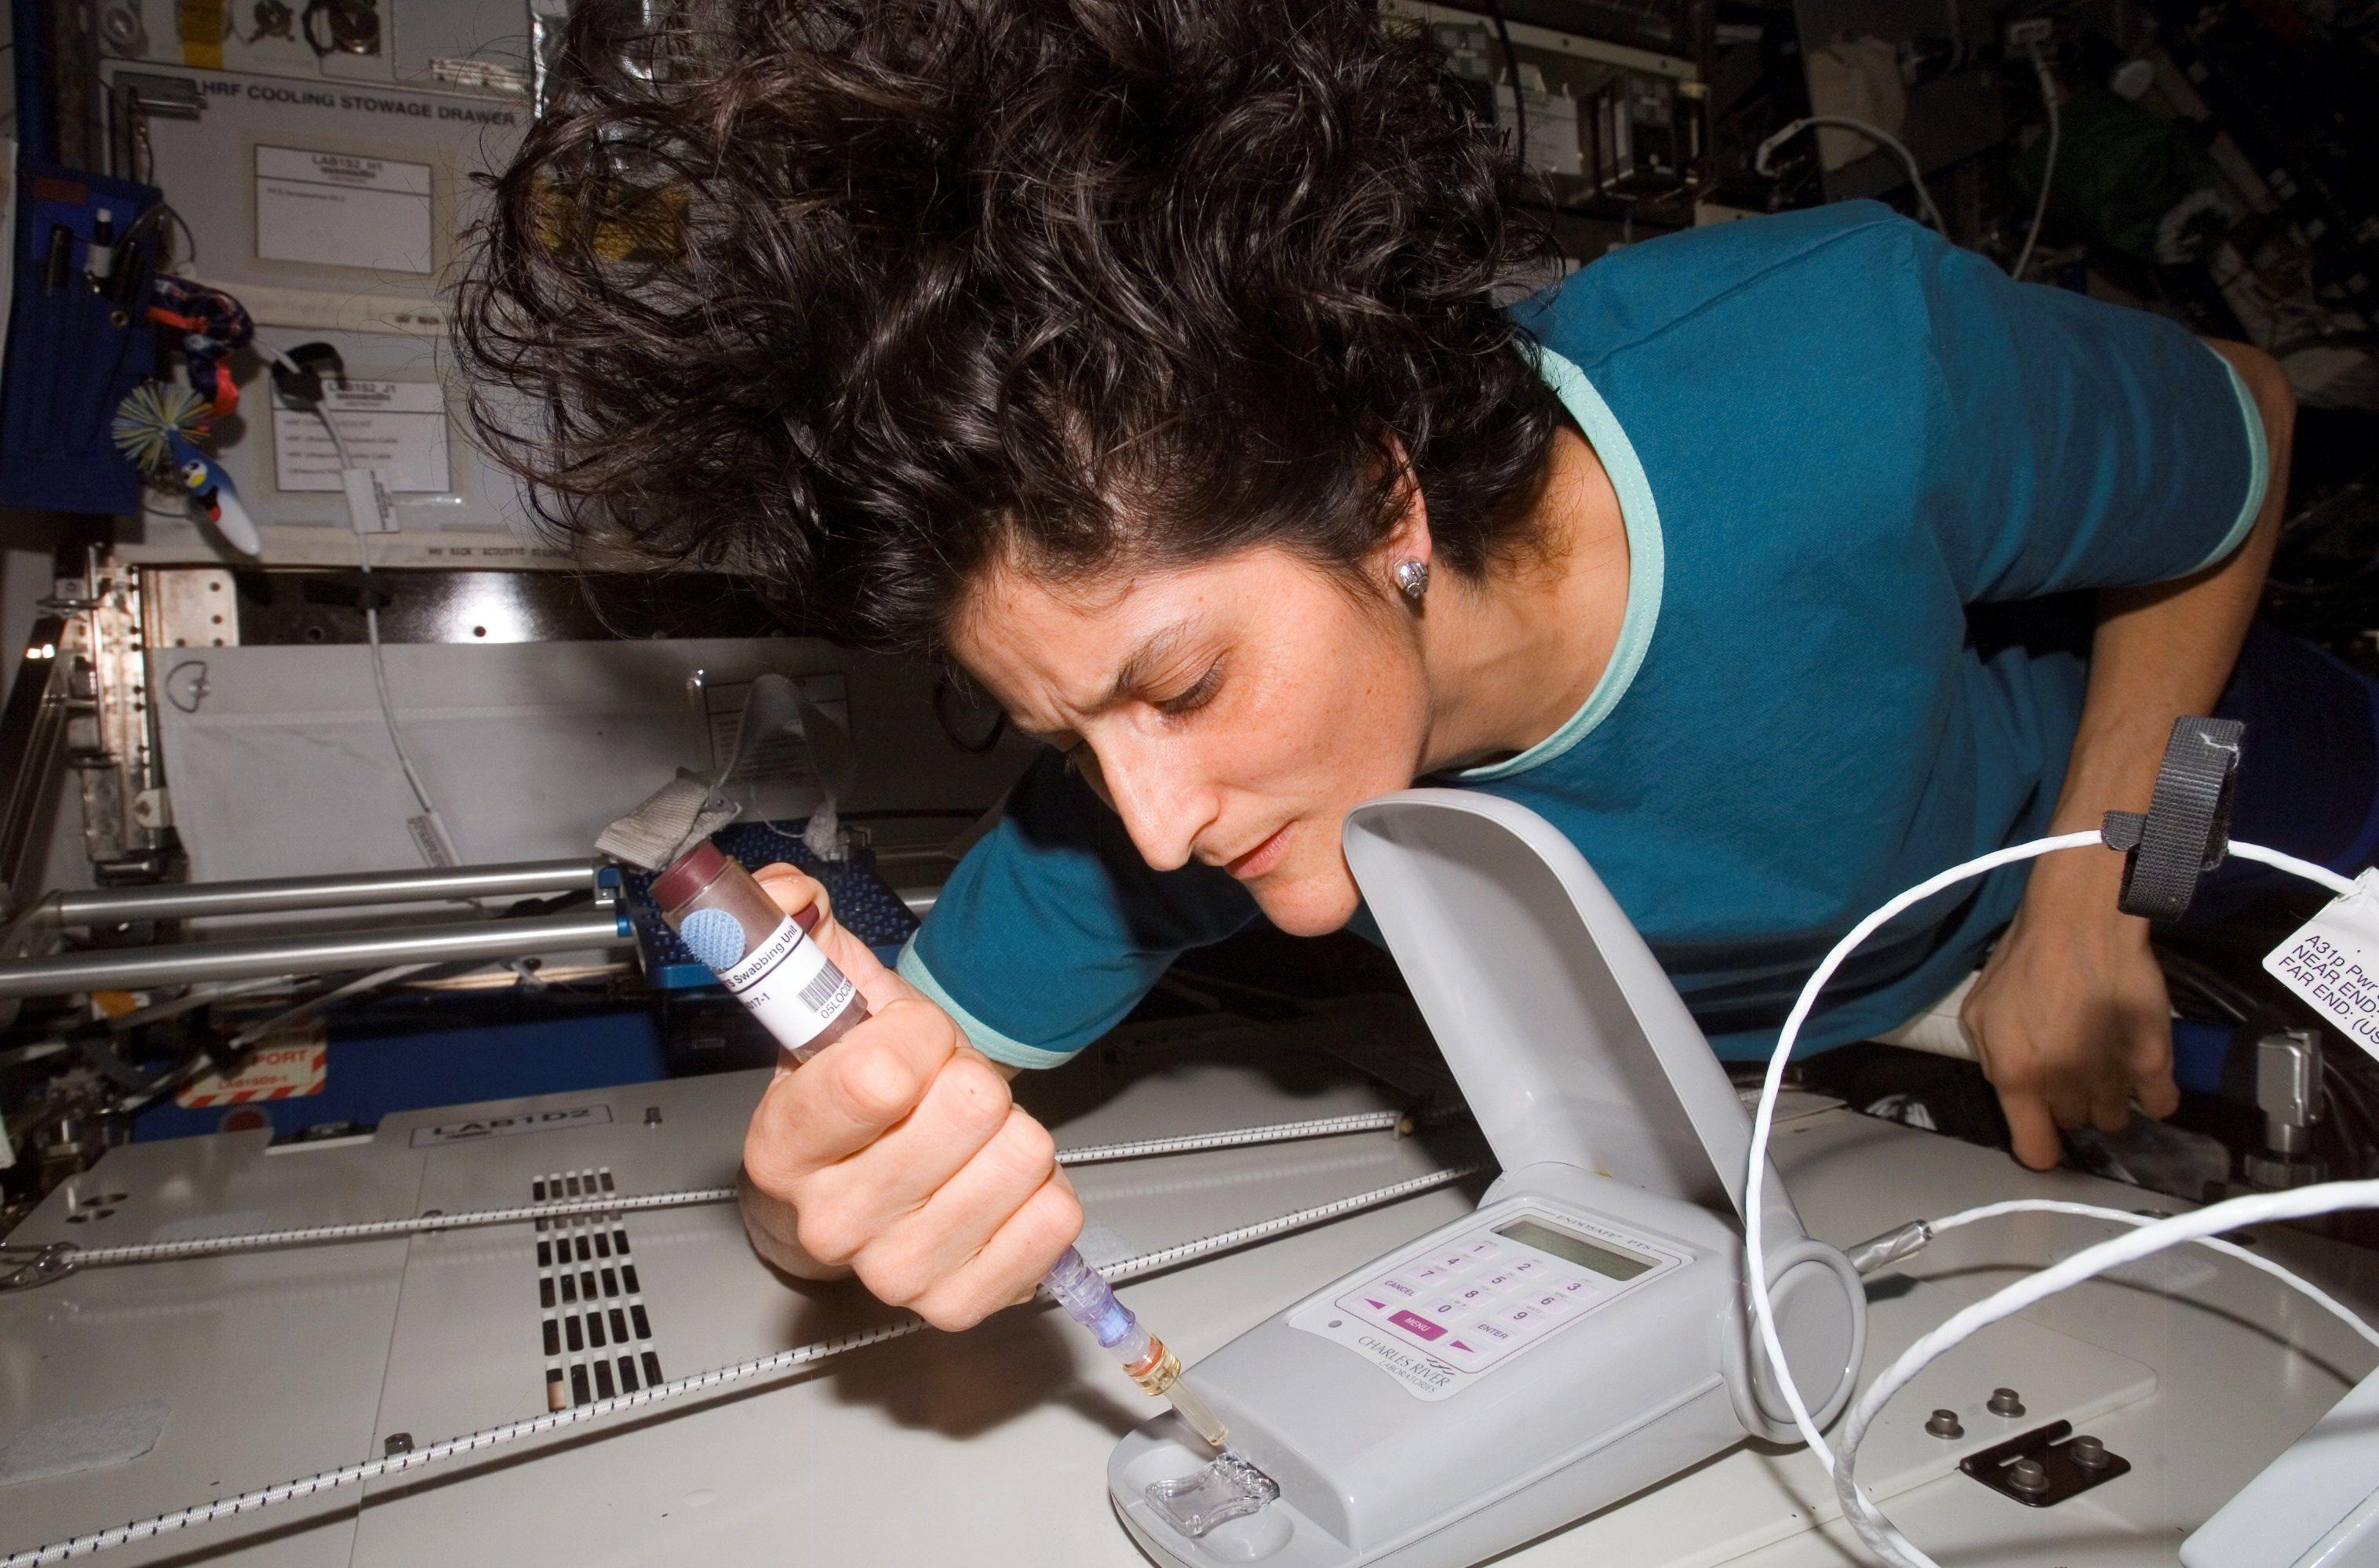 suni williams astronaut - photo #20